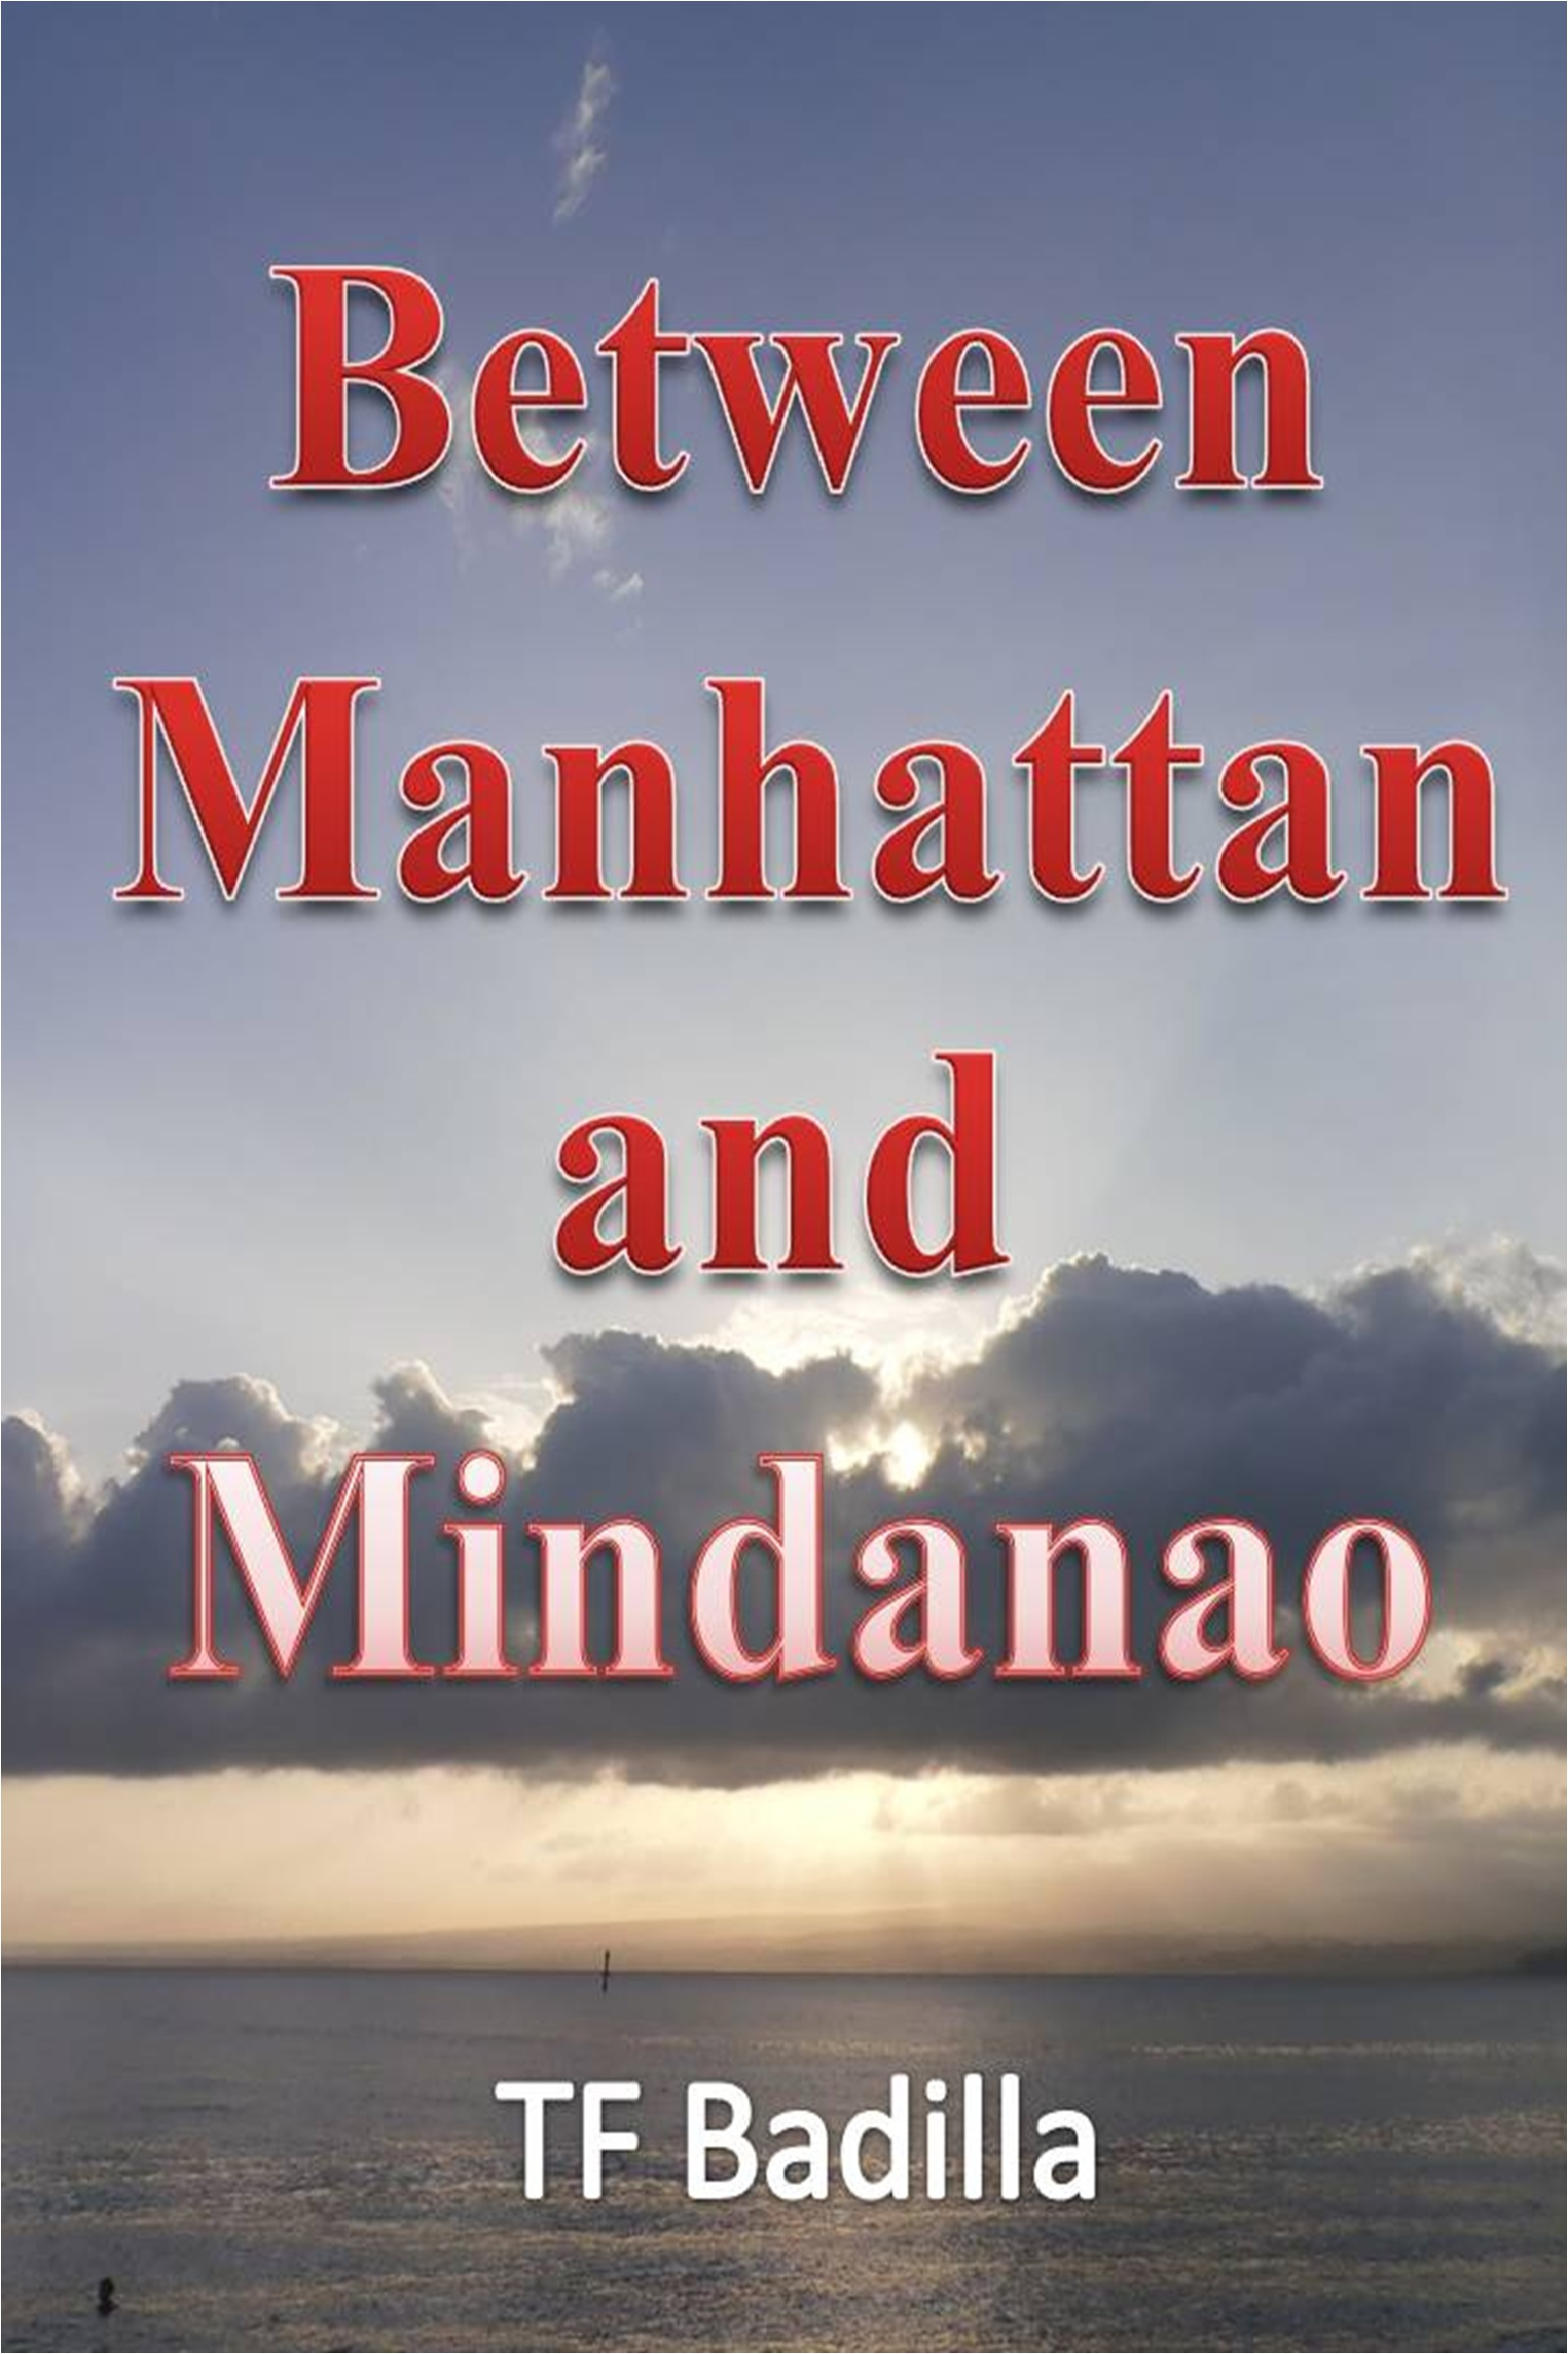 Smashwords – Between Manhattan and Mindanao – a book by TF Badilla